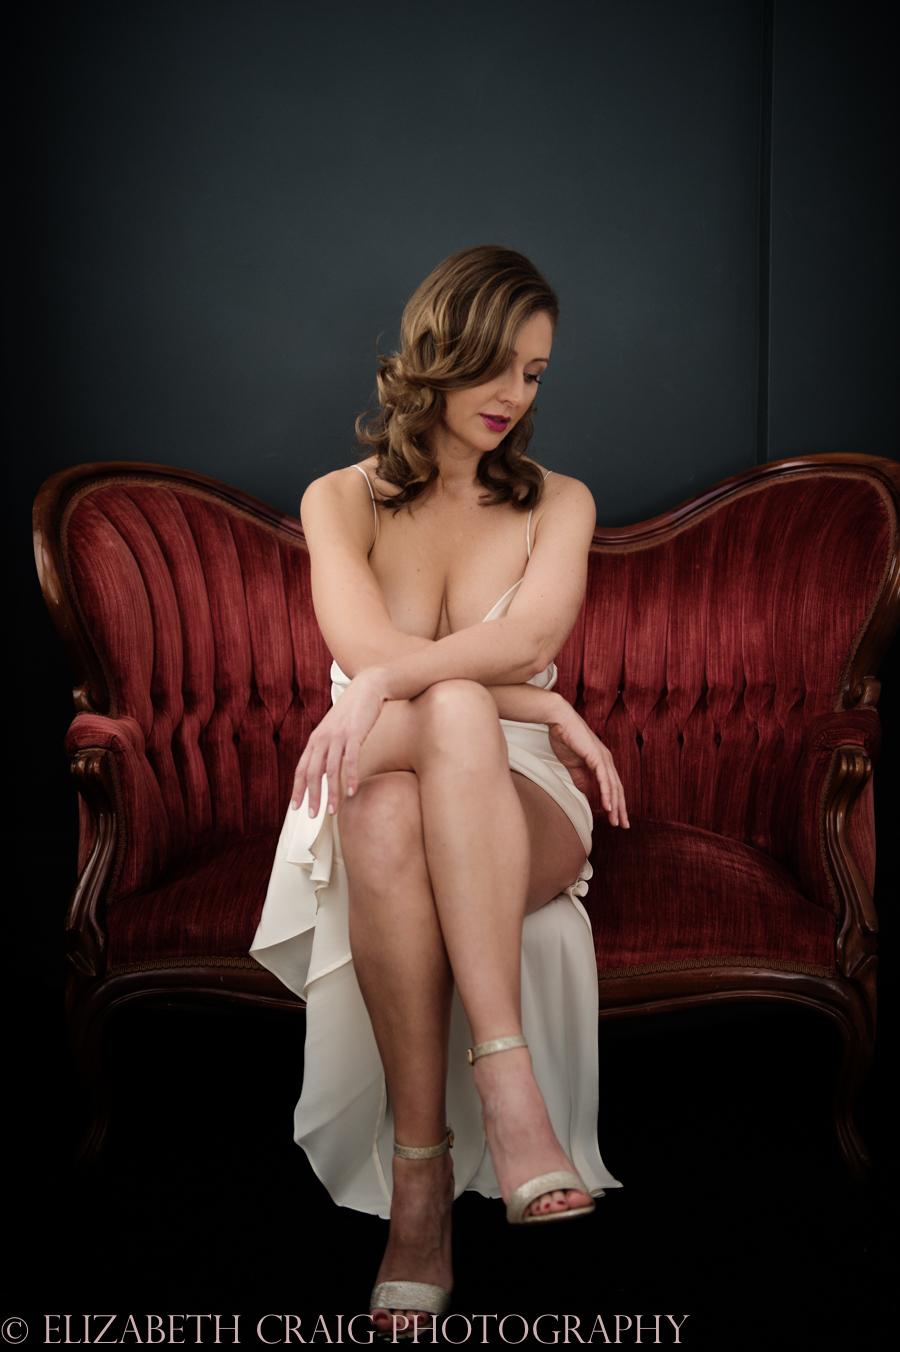 pittsburgh-woman-portrait-photographer-elizabeth-craig-photography-003